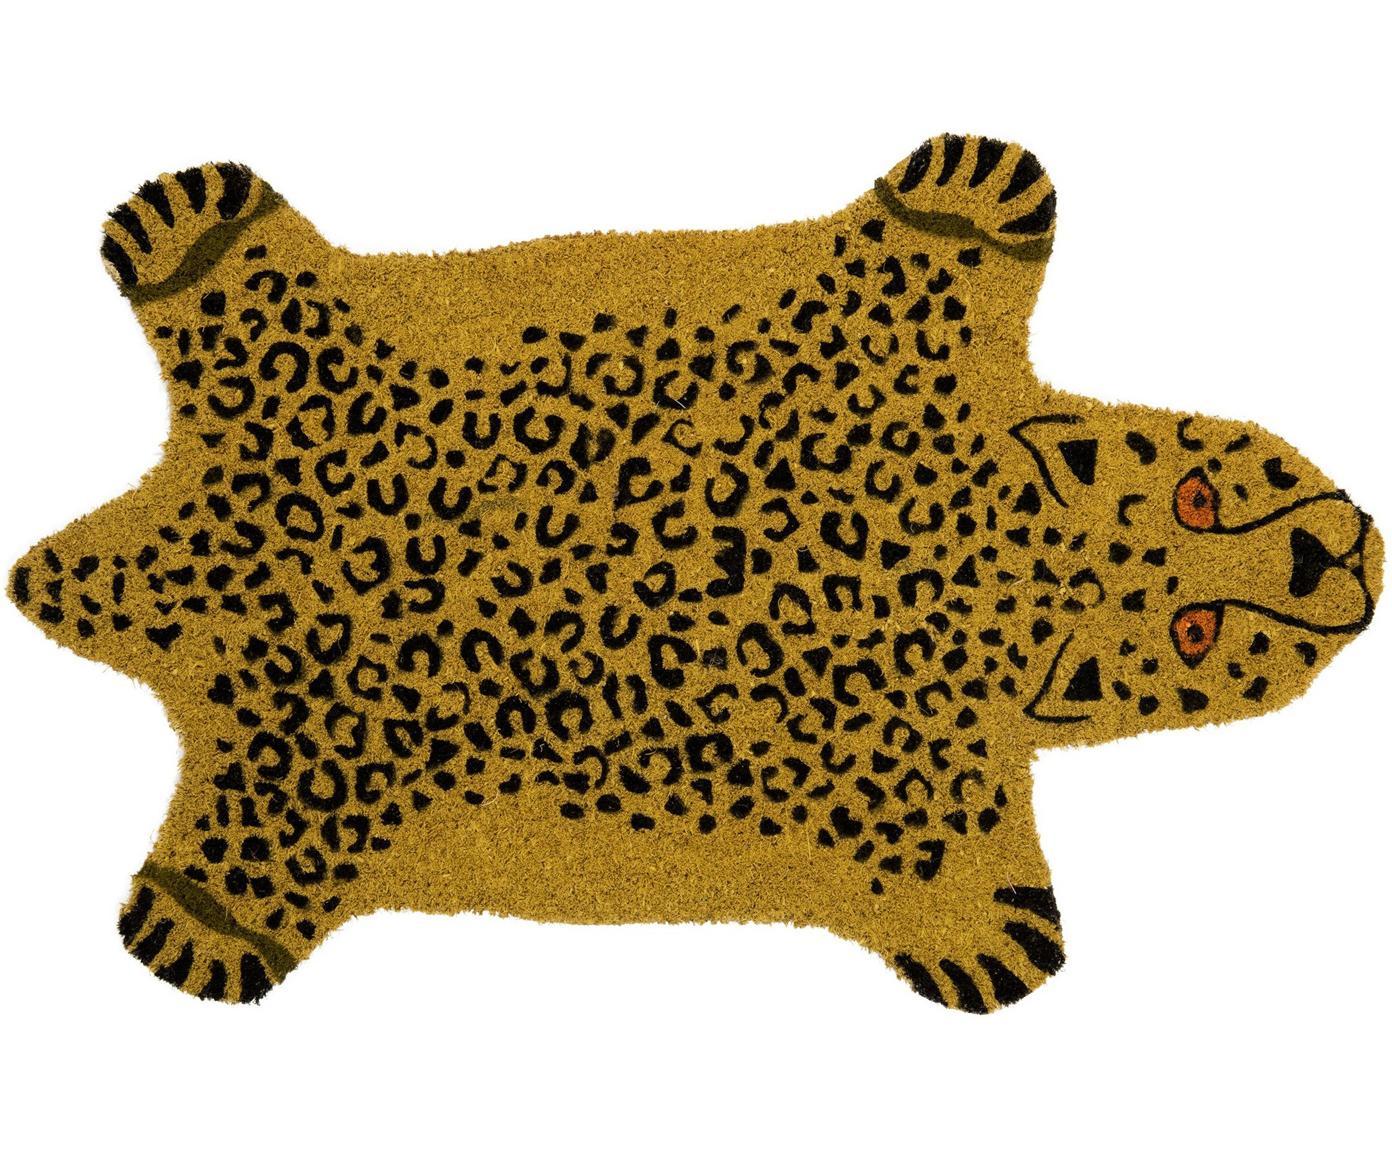 Deurmat Cheetah, Kokosvezels, Bruin, zwart, 45 x 70 cm